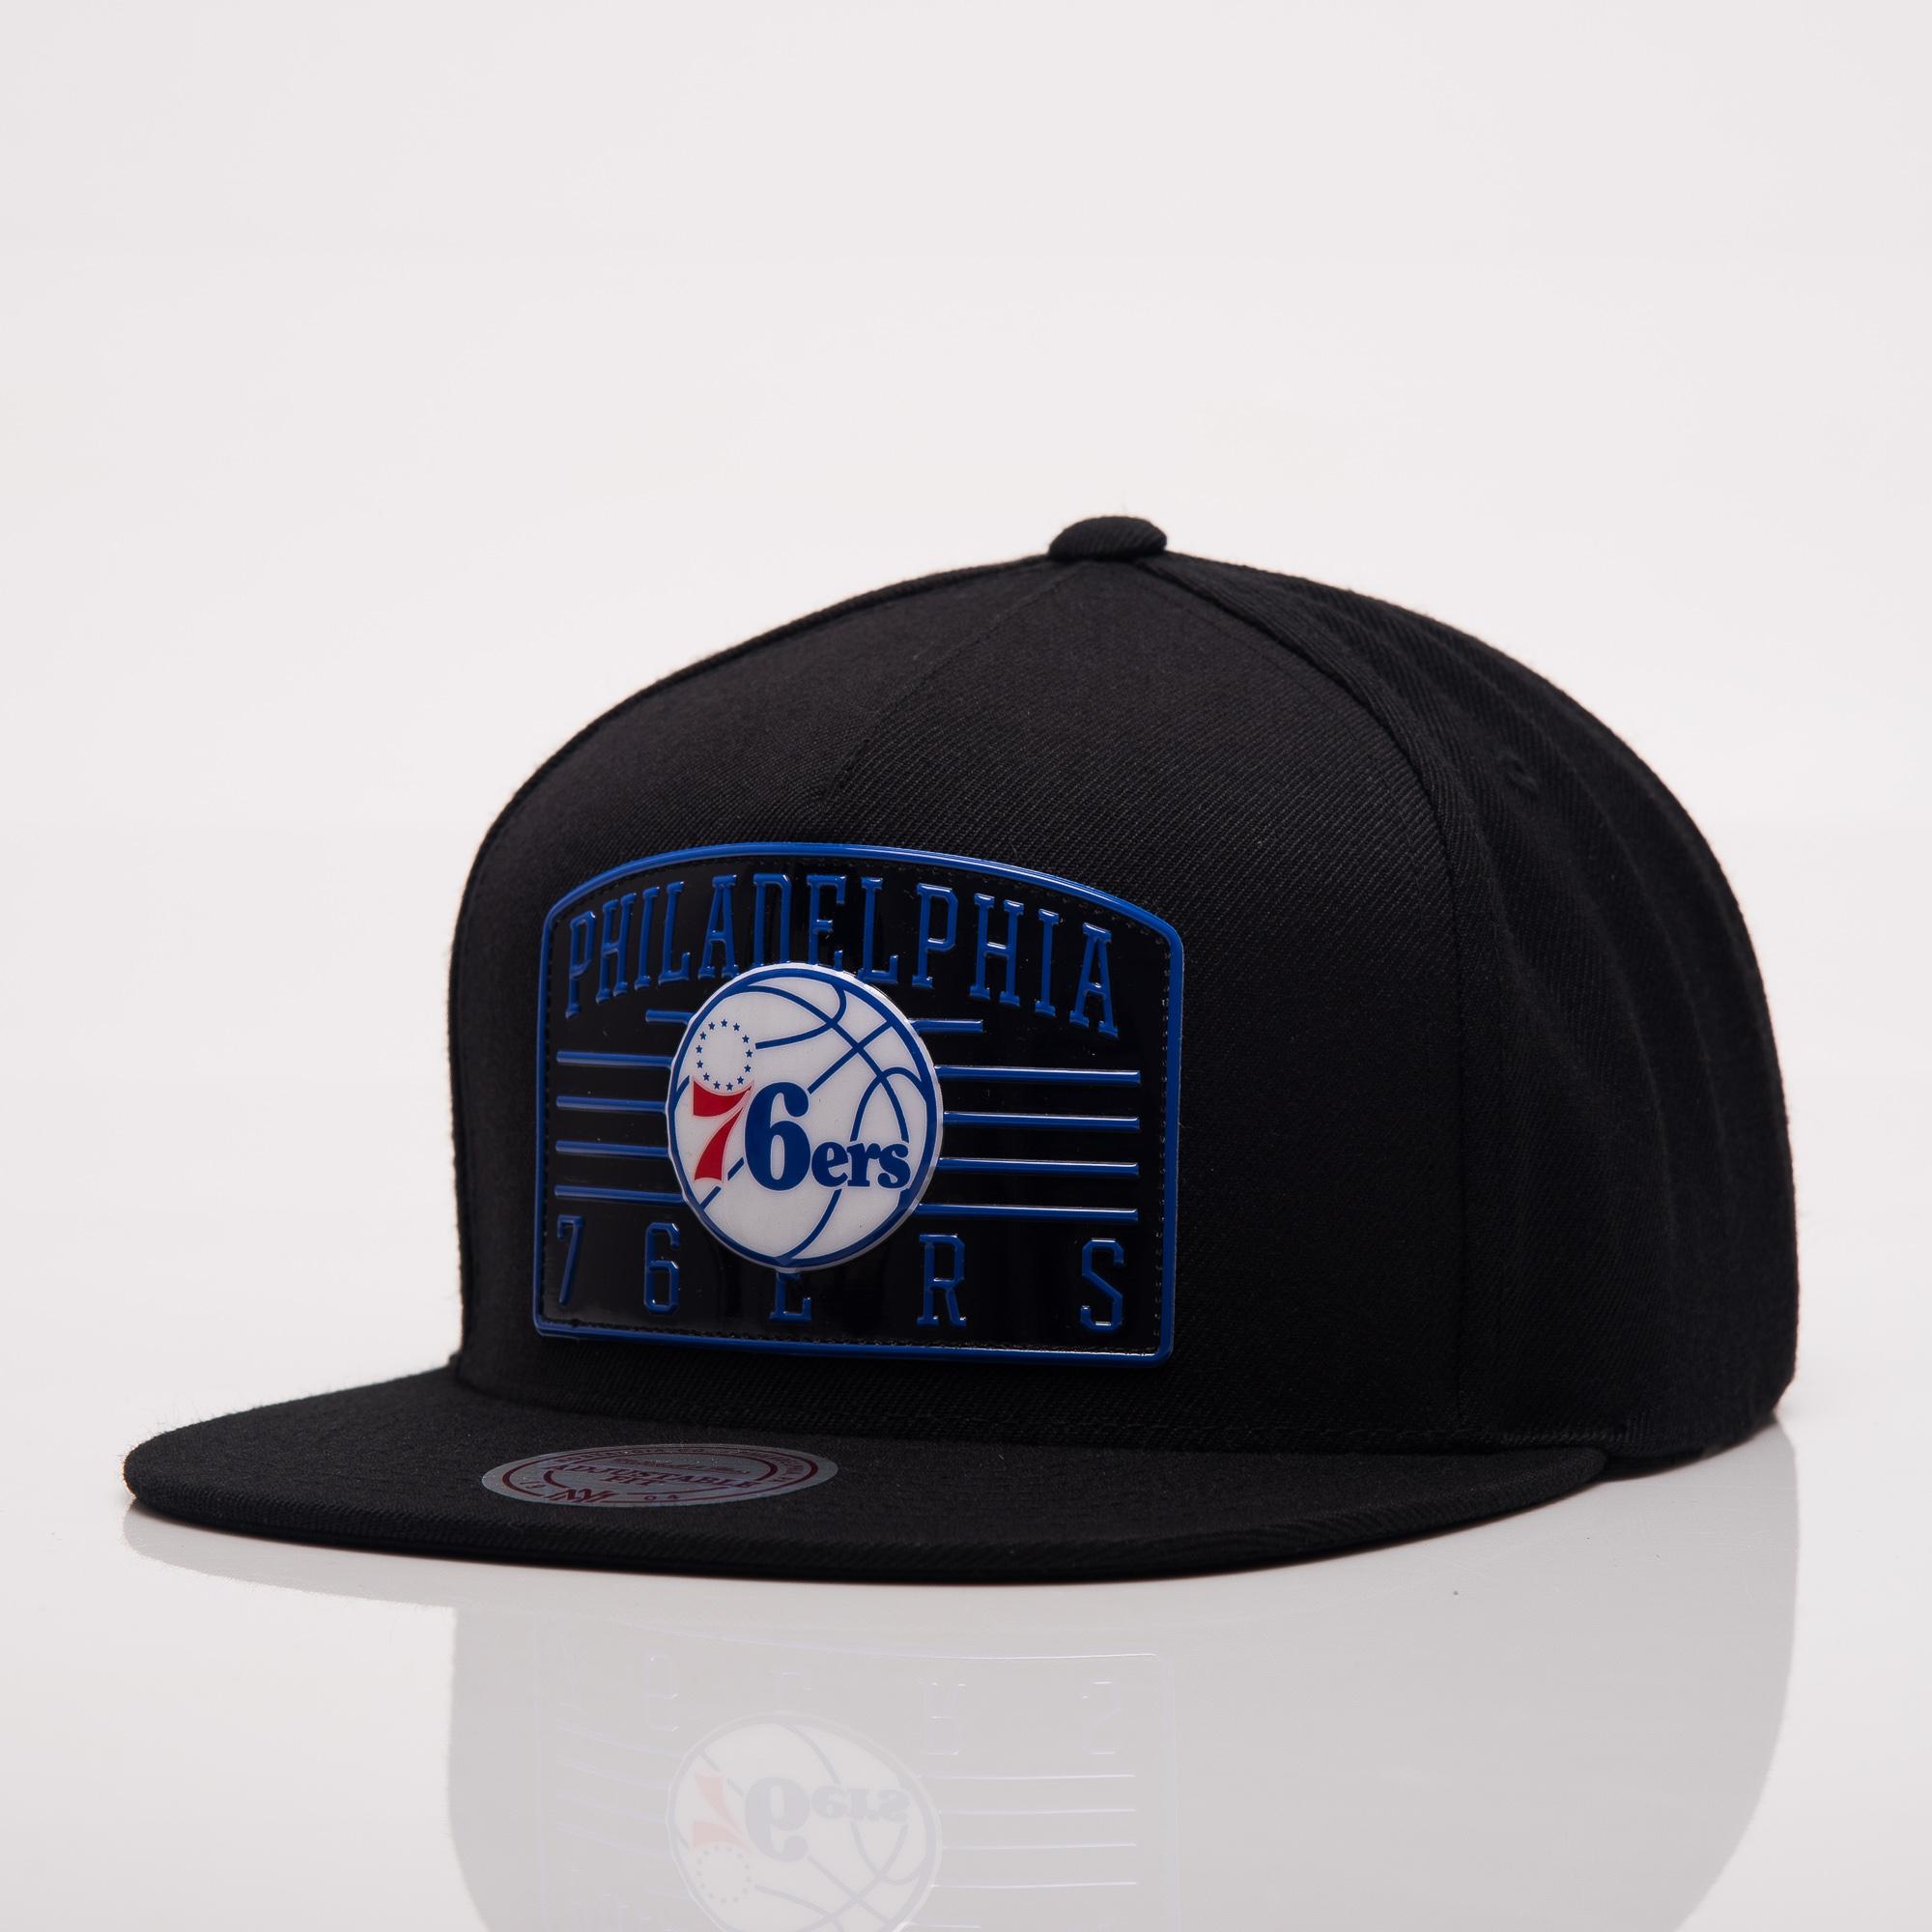 717e6a98aa6 Mitchell Ness NBA Philadelphia 76ers Weald Patch Snapback Cap - NBA Shop Philadelphia  76ers Merchandise - Superfanas.lt